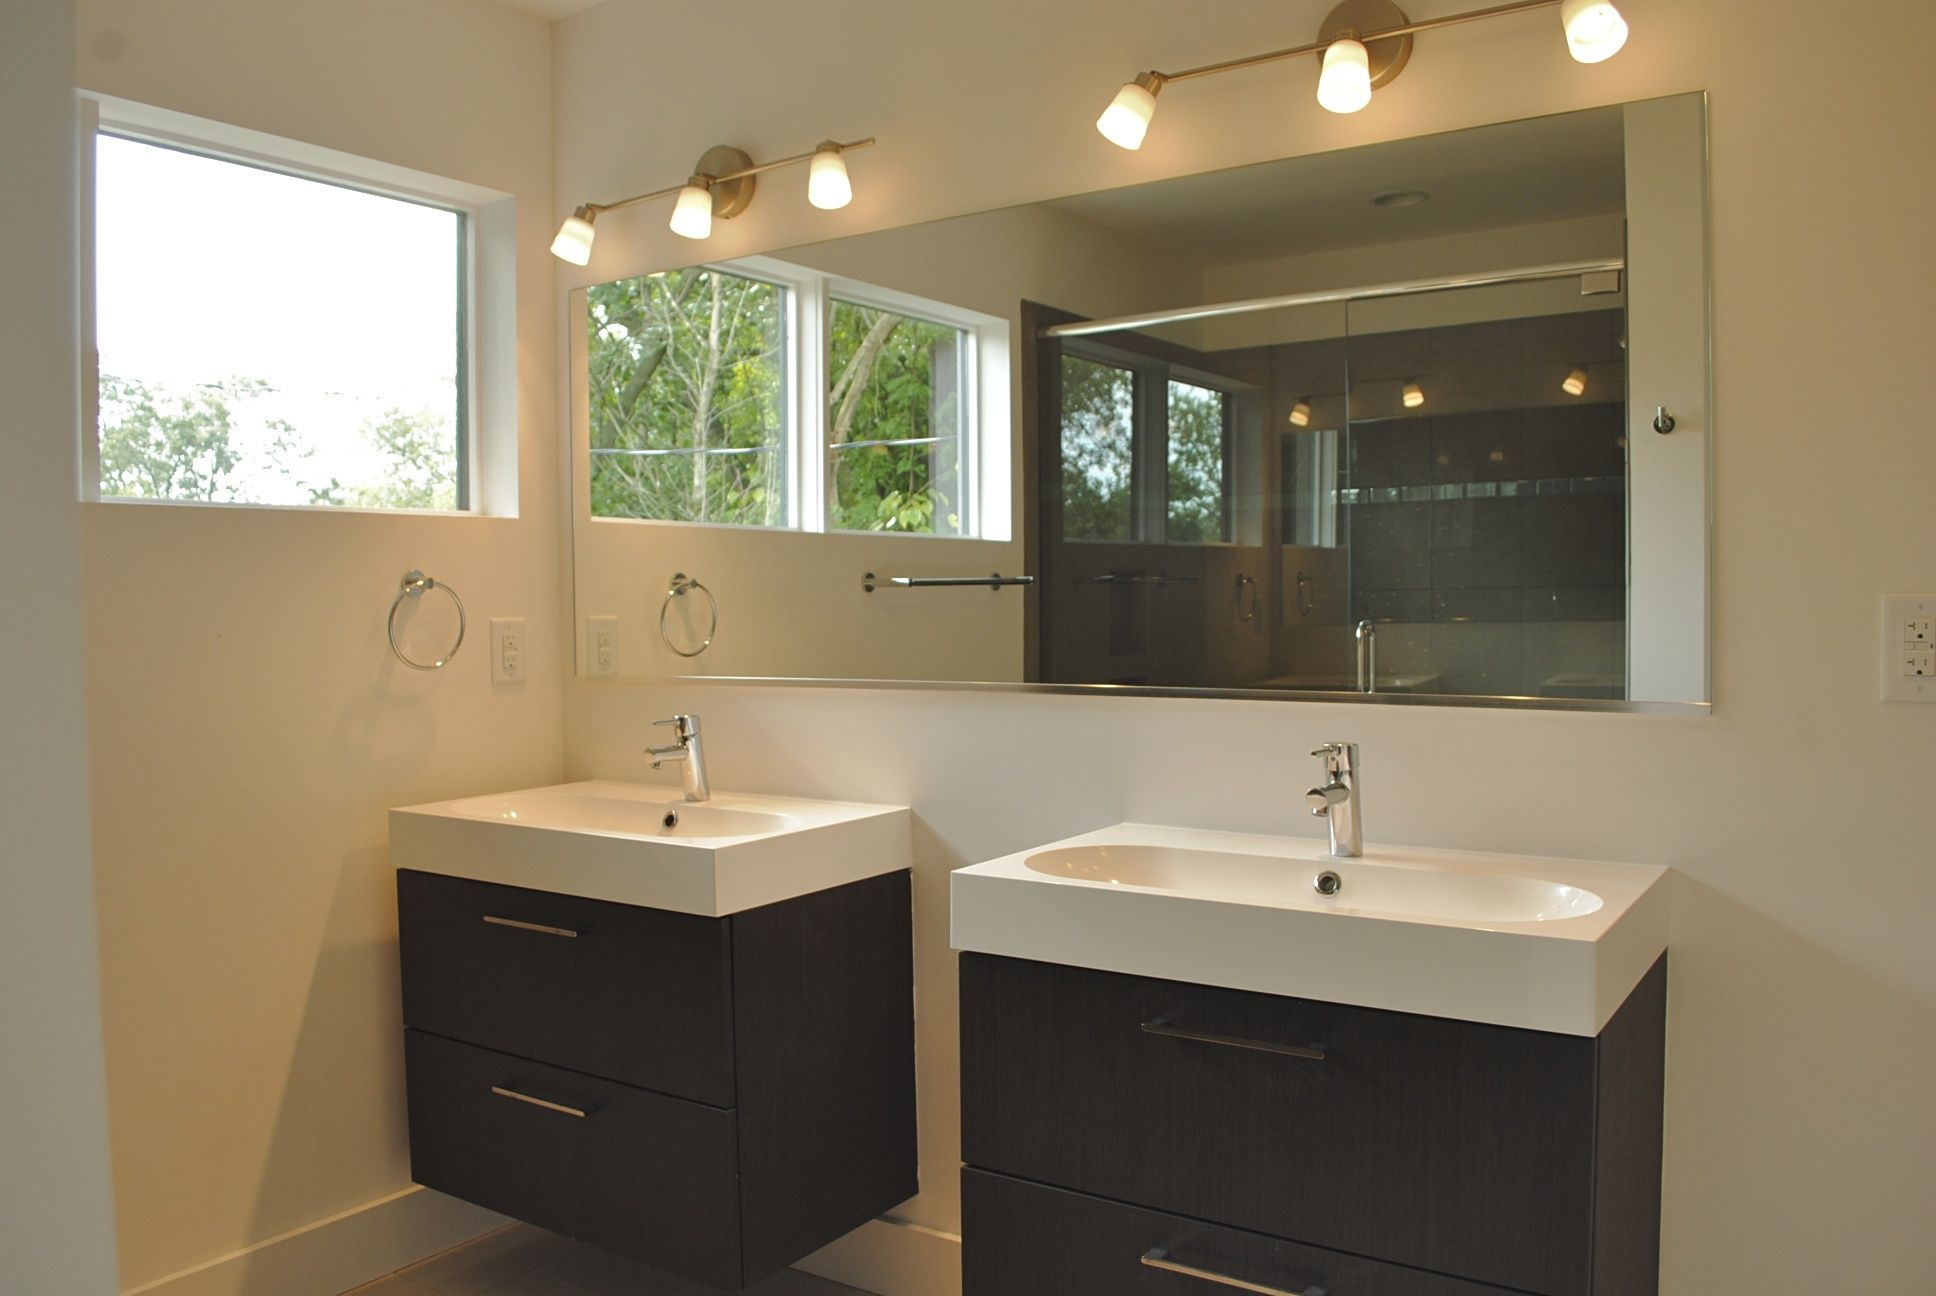 Ikea Bathroom Vanity Units For Your House Decor Twin